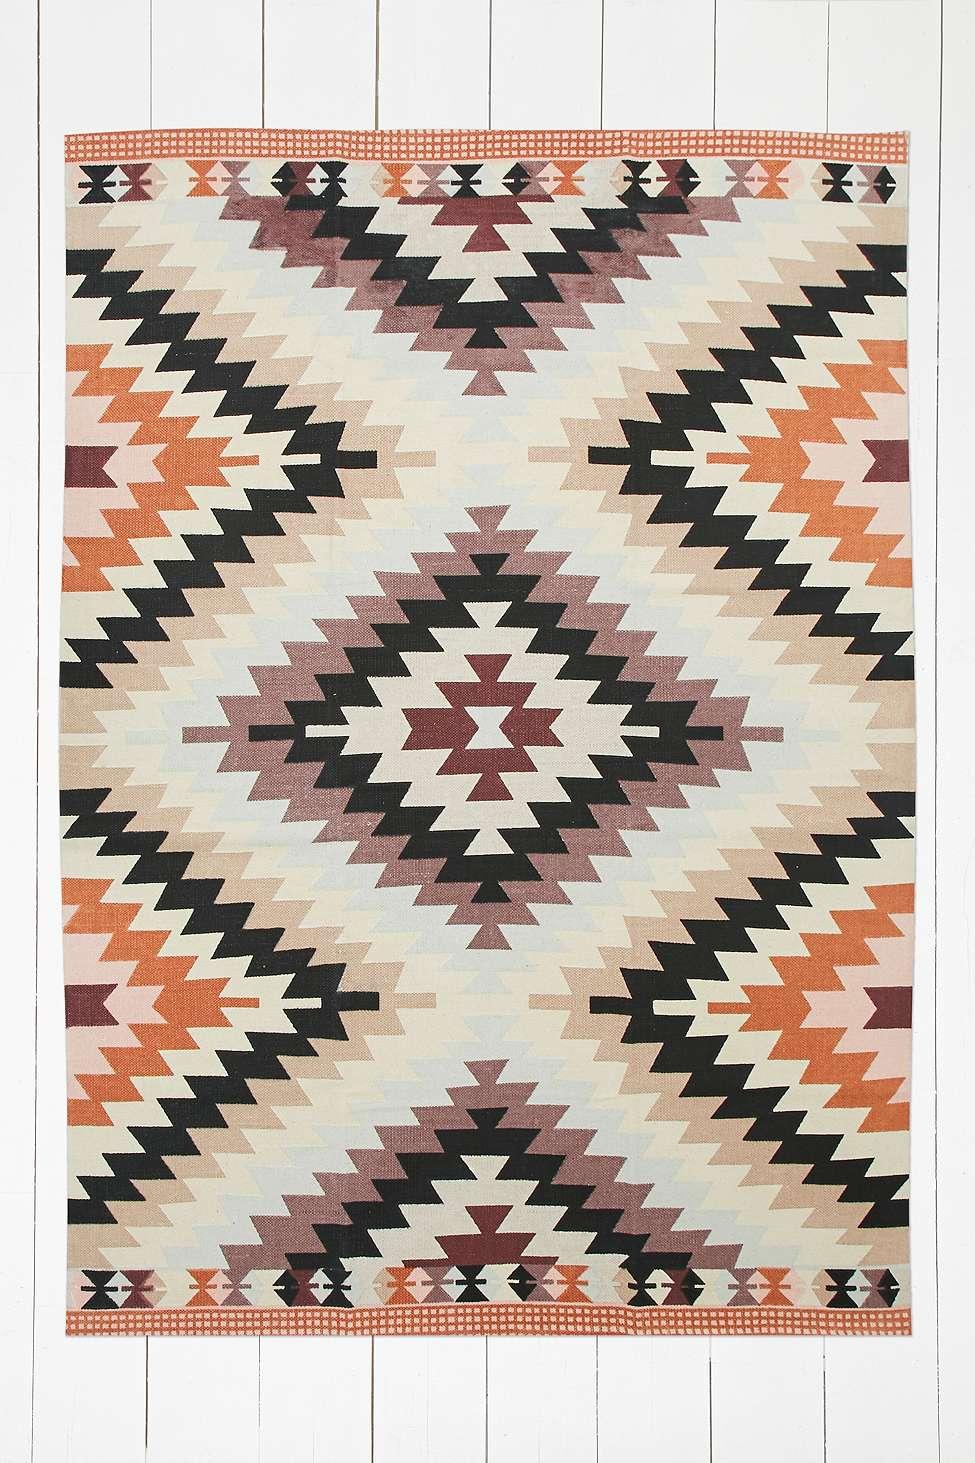 tapis ethniques imprim s et color s. Black Bedroom Furniture Sets. Home Design Ideas